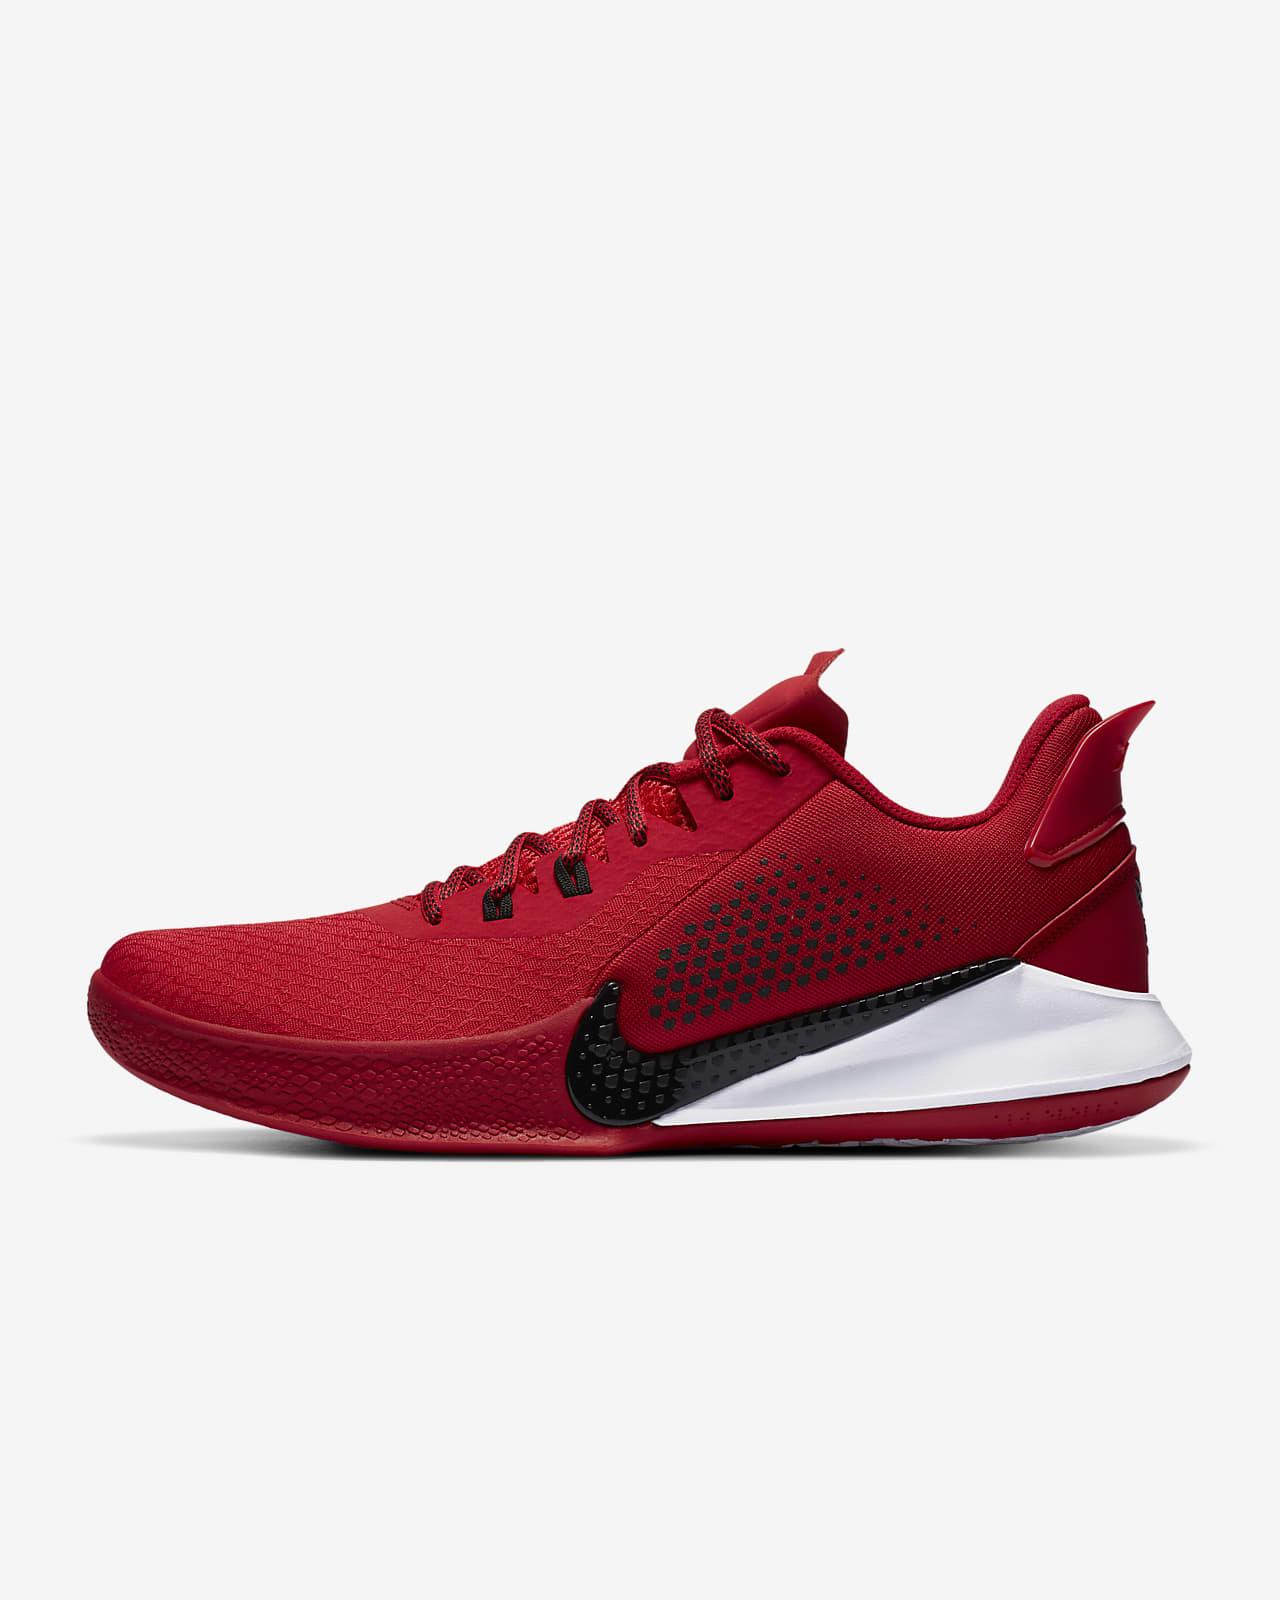 Mamba Fury (Team) Basketball Shoe